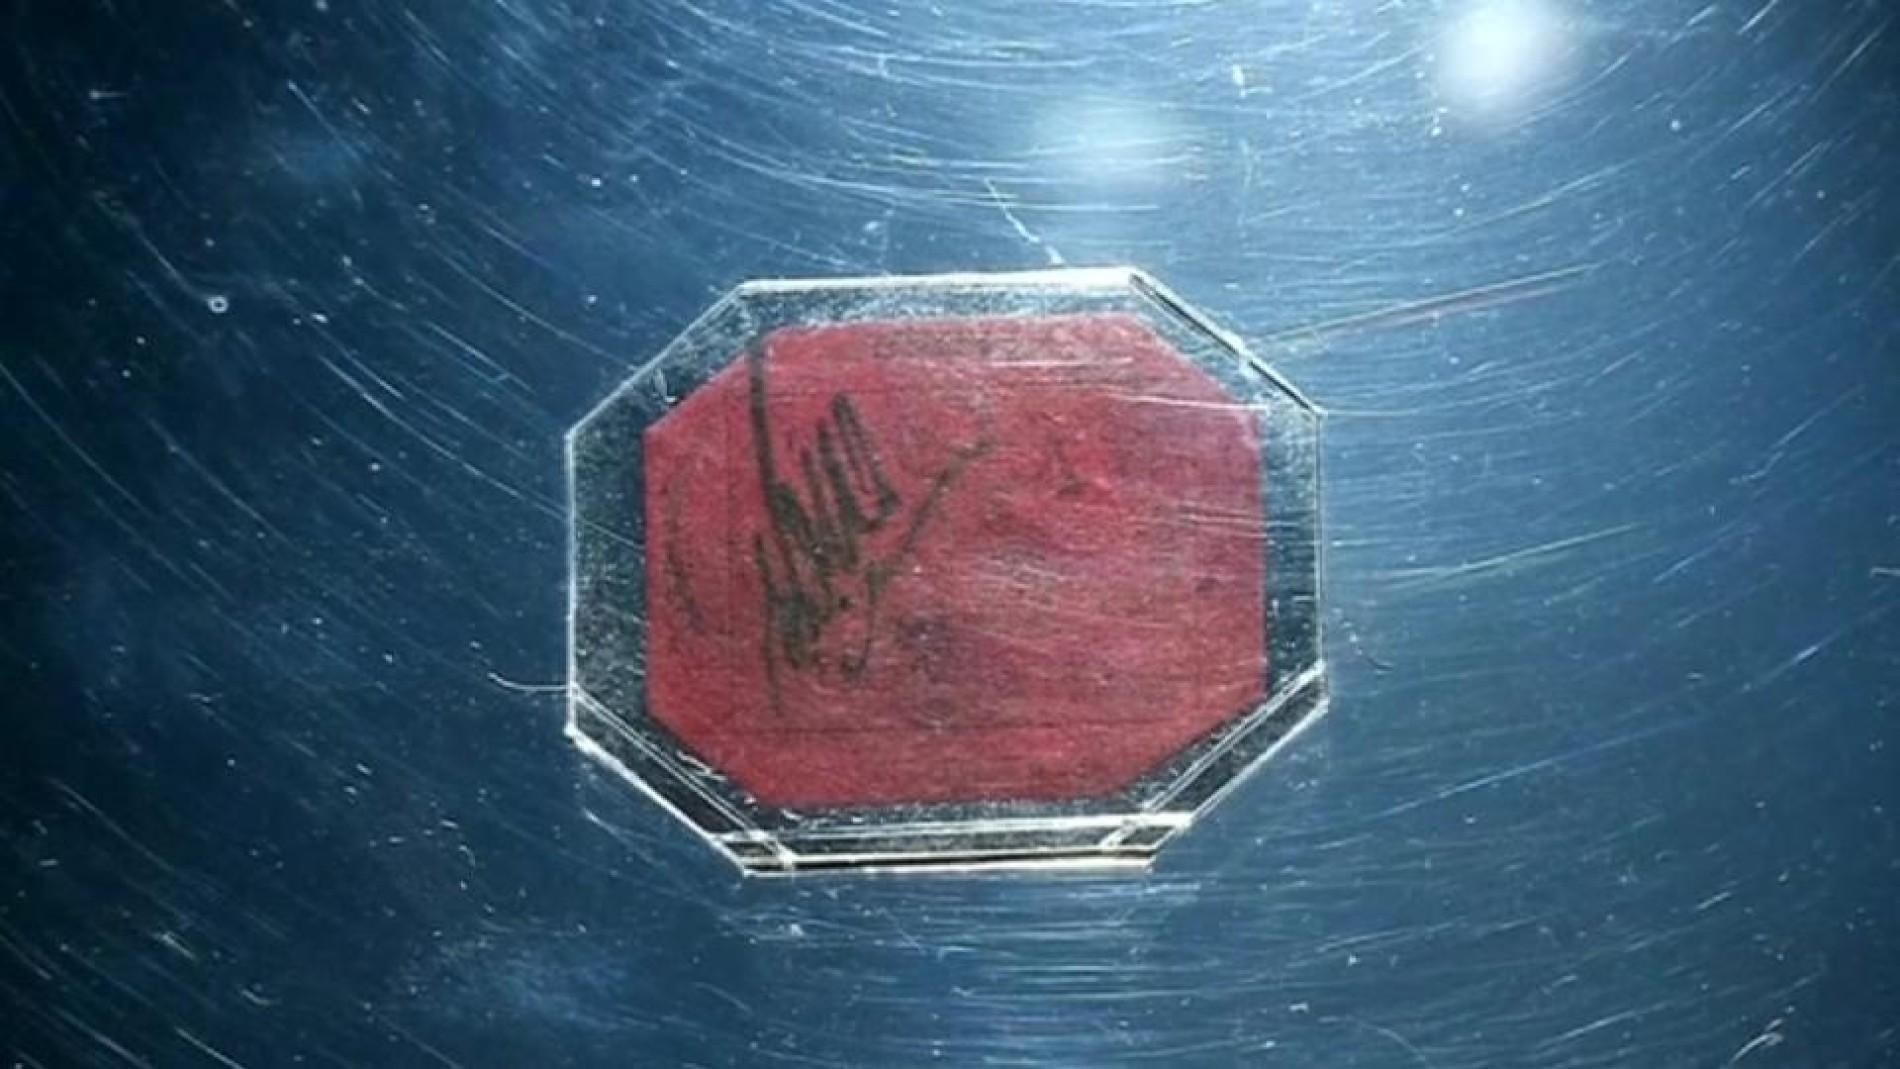 New York Teuerste Briefmarke Der Welt Versteigert Gesellschaft Faz